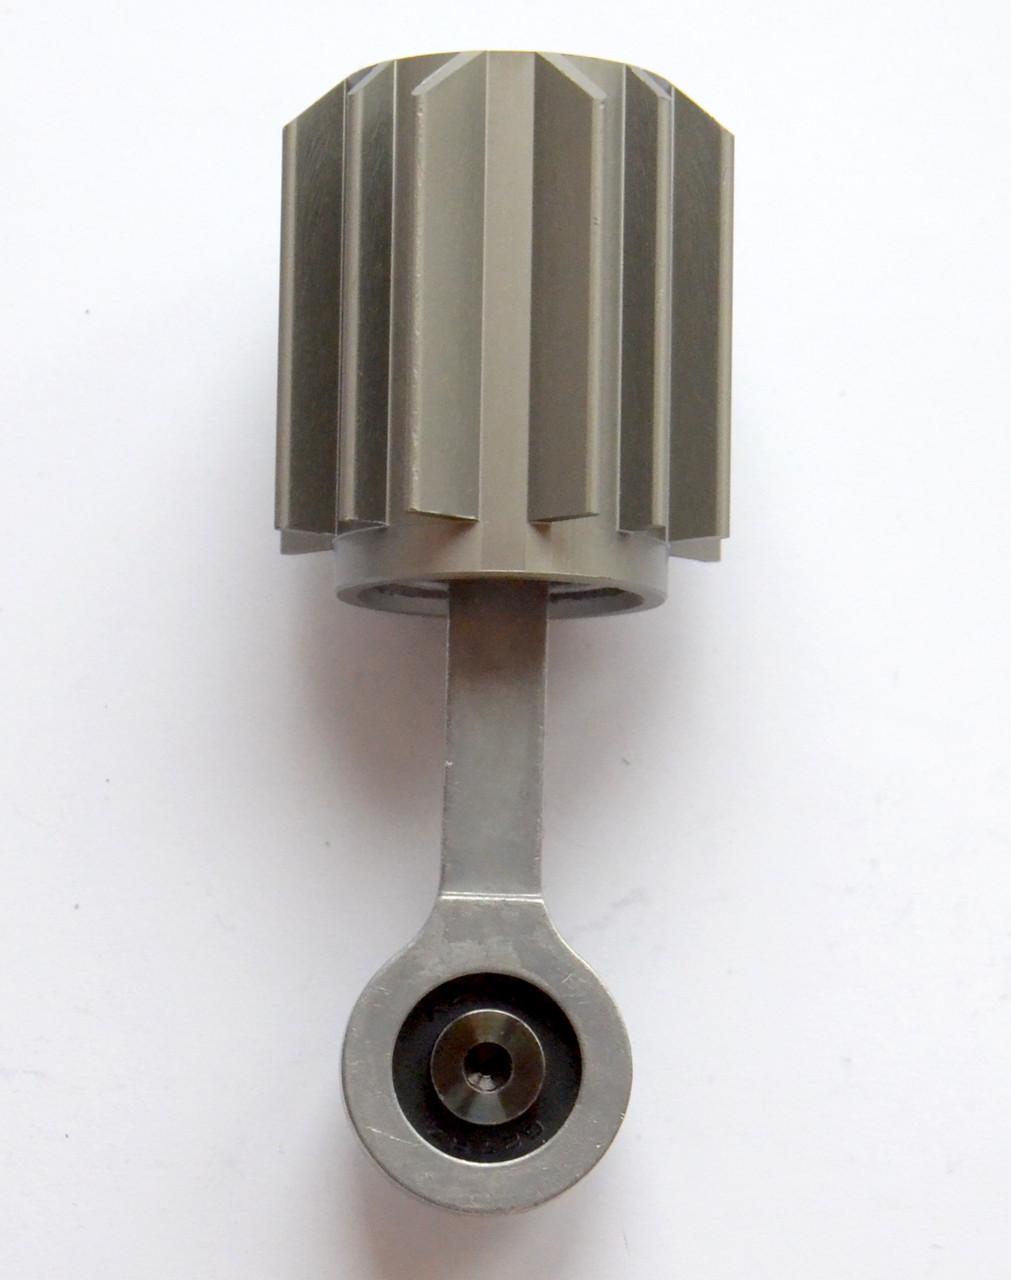 Ремкомплект для компрессора пневмоподвески Land Rover Discovery 3, Range Rover Sport HITACHI